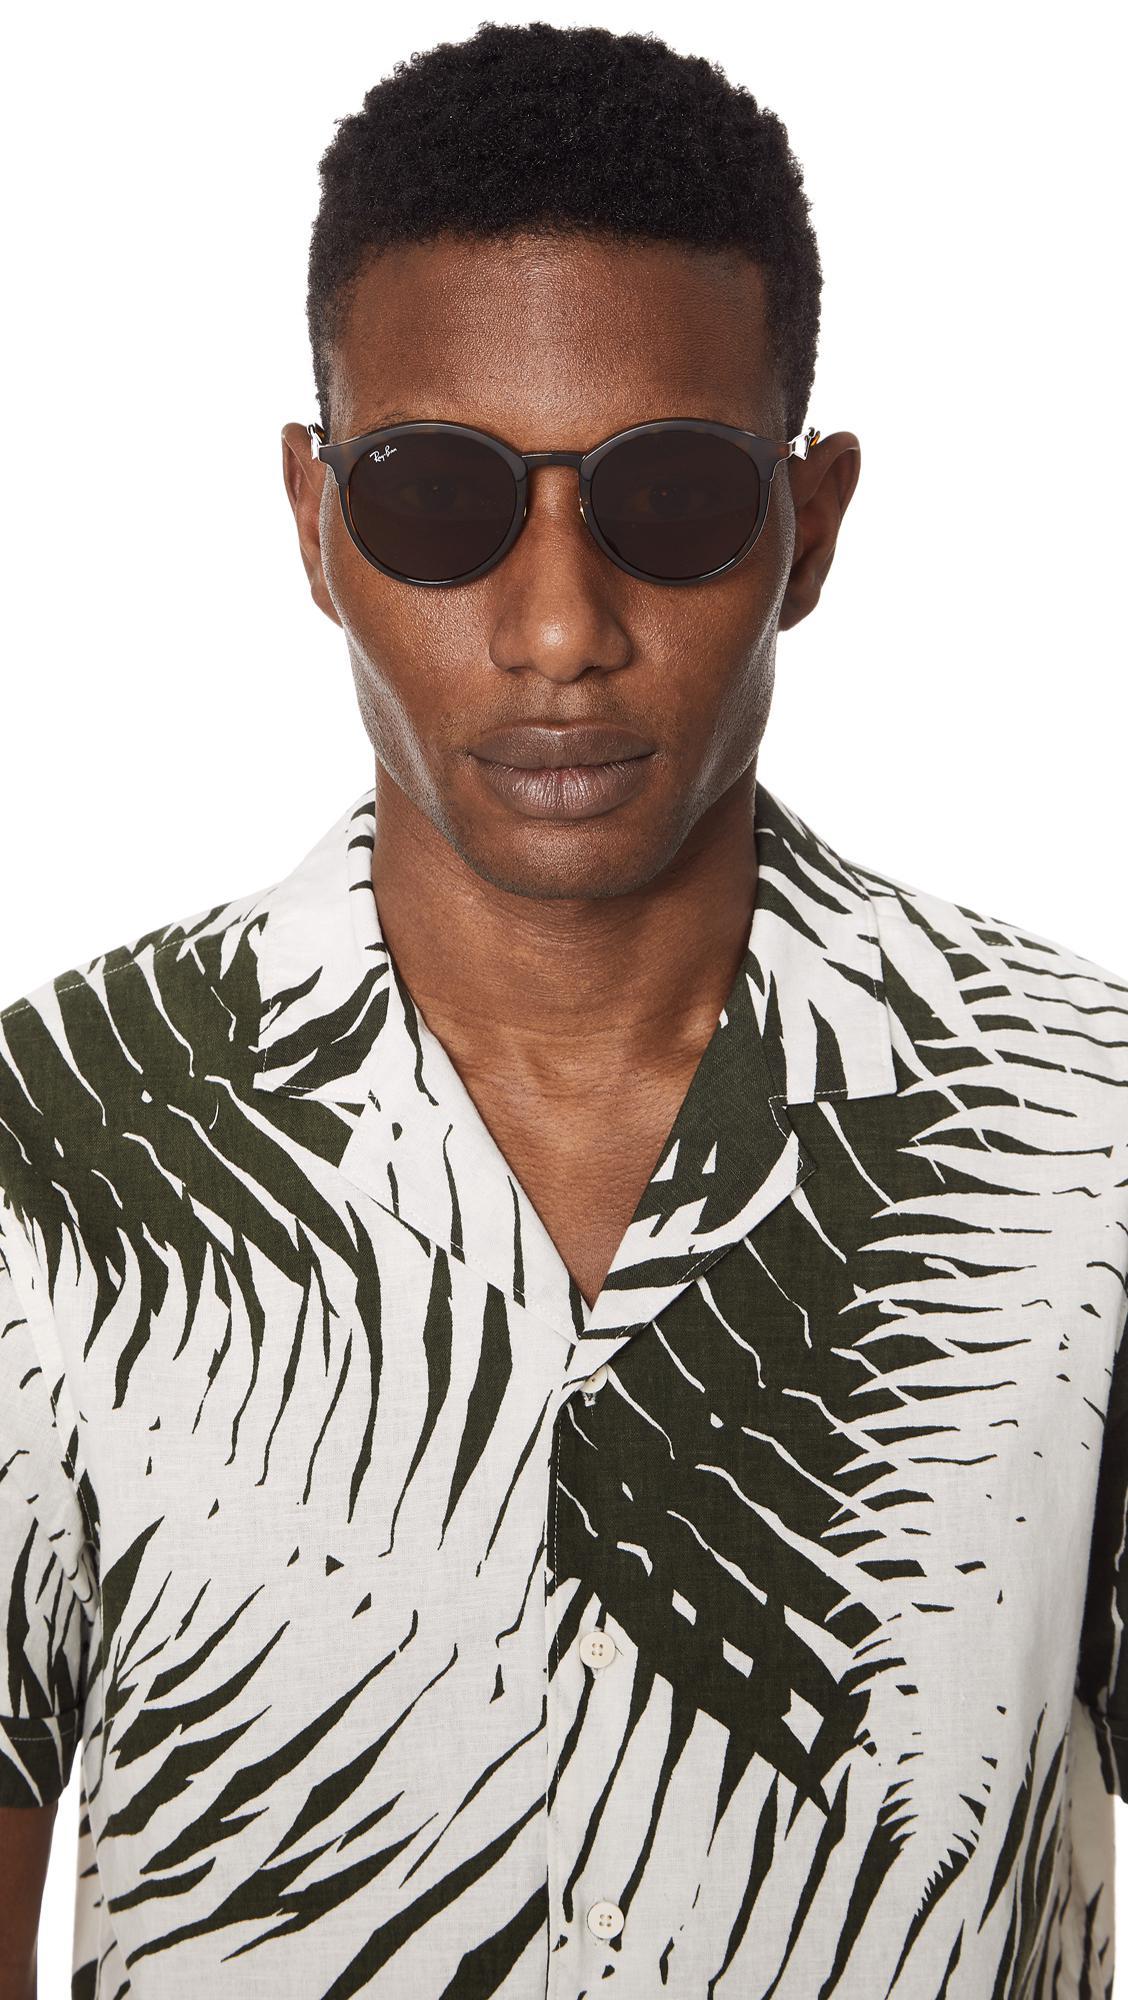 bc9912911a Ray-Ban - Brown Emma Sunglasses for Men - Lyst. View fullscreen